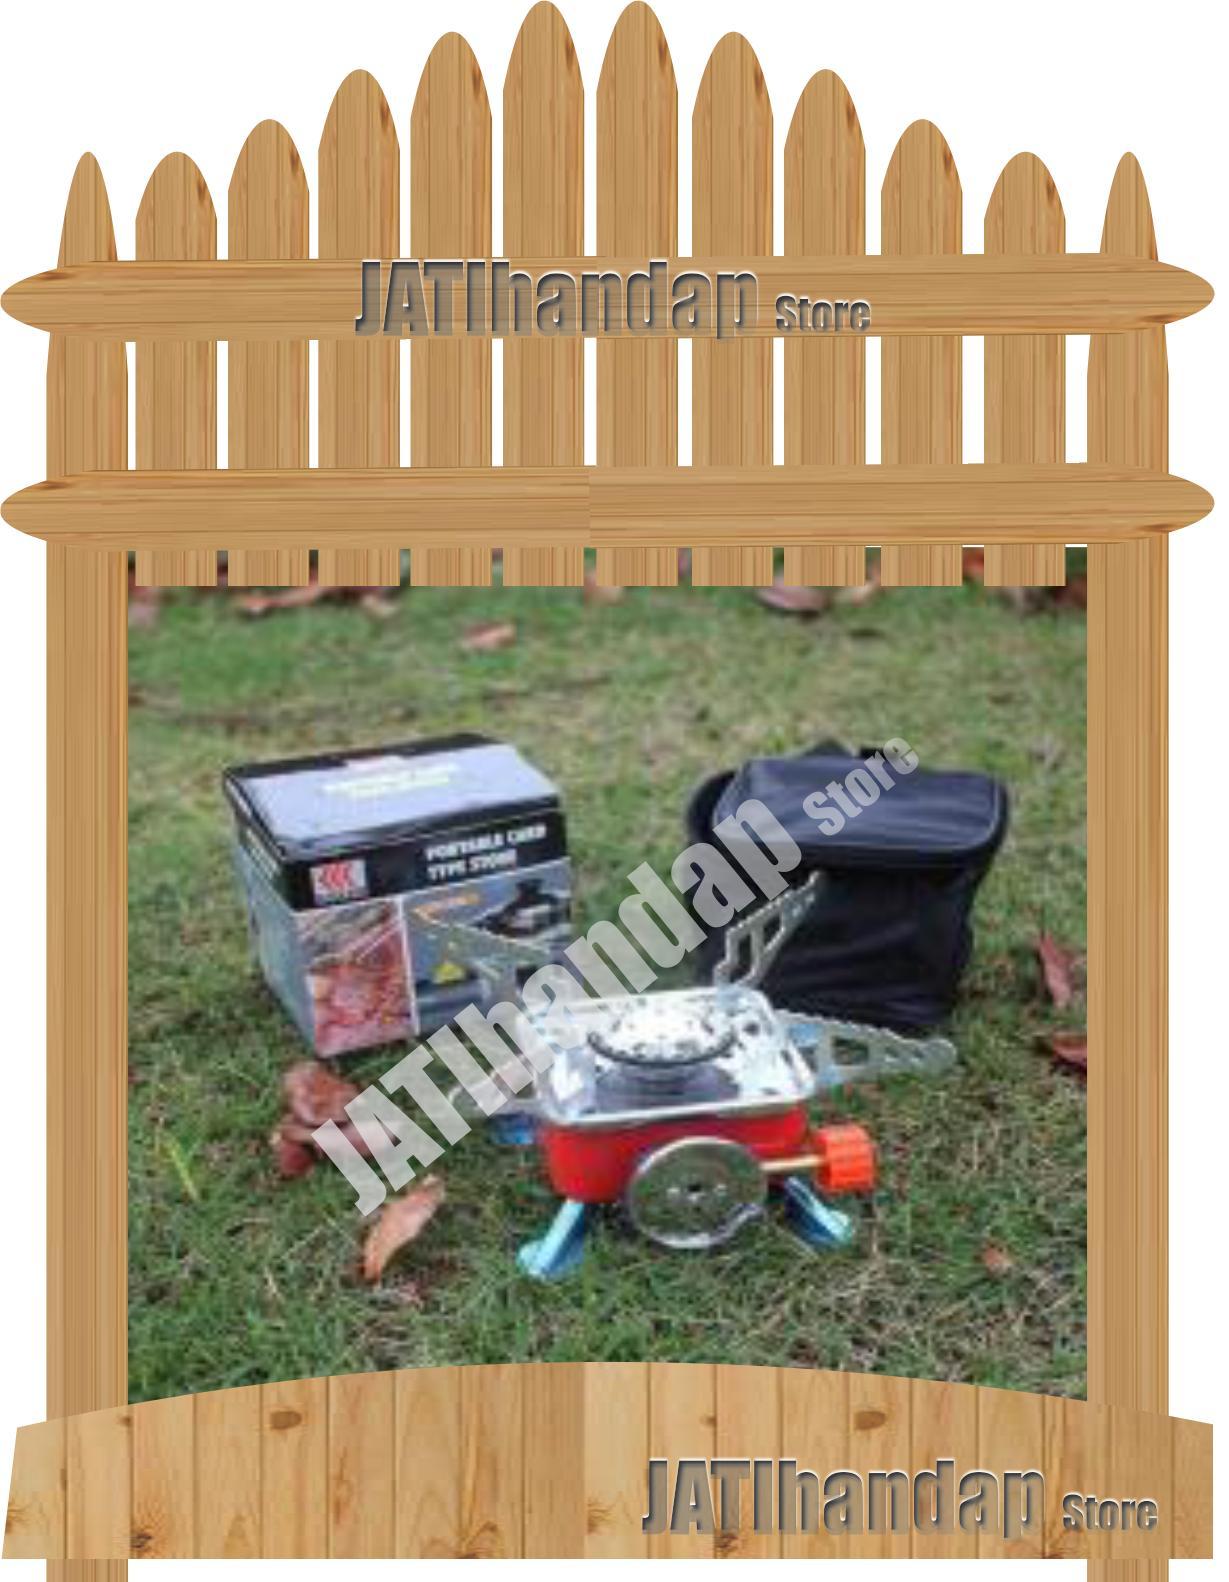 Kompor Camping Mini Portable Hoki Kovar Kompor Gas Lipat Travel Portabel untuk Camping Berkemah Portable